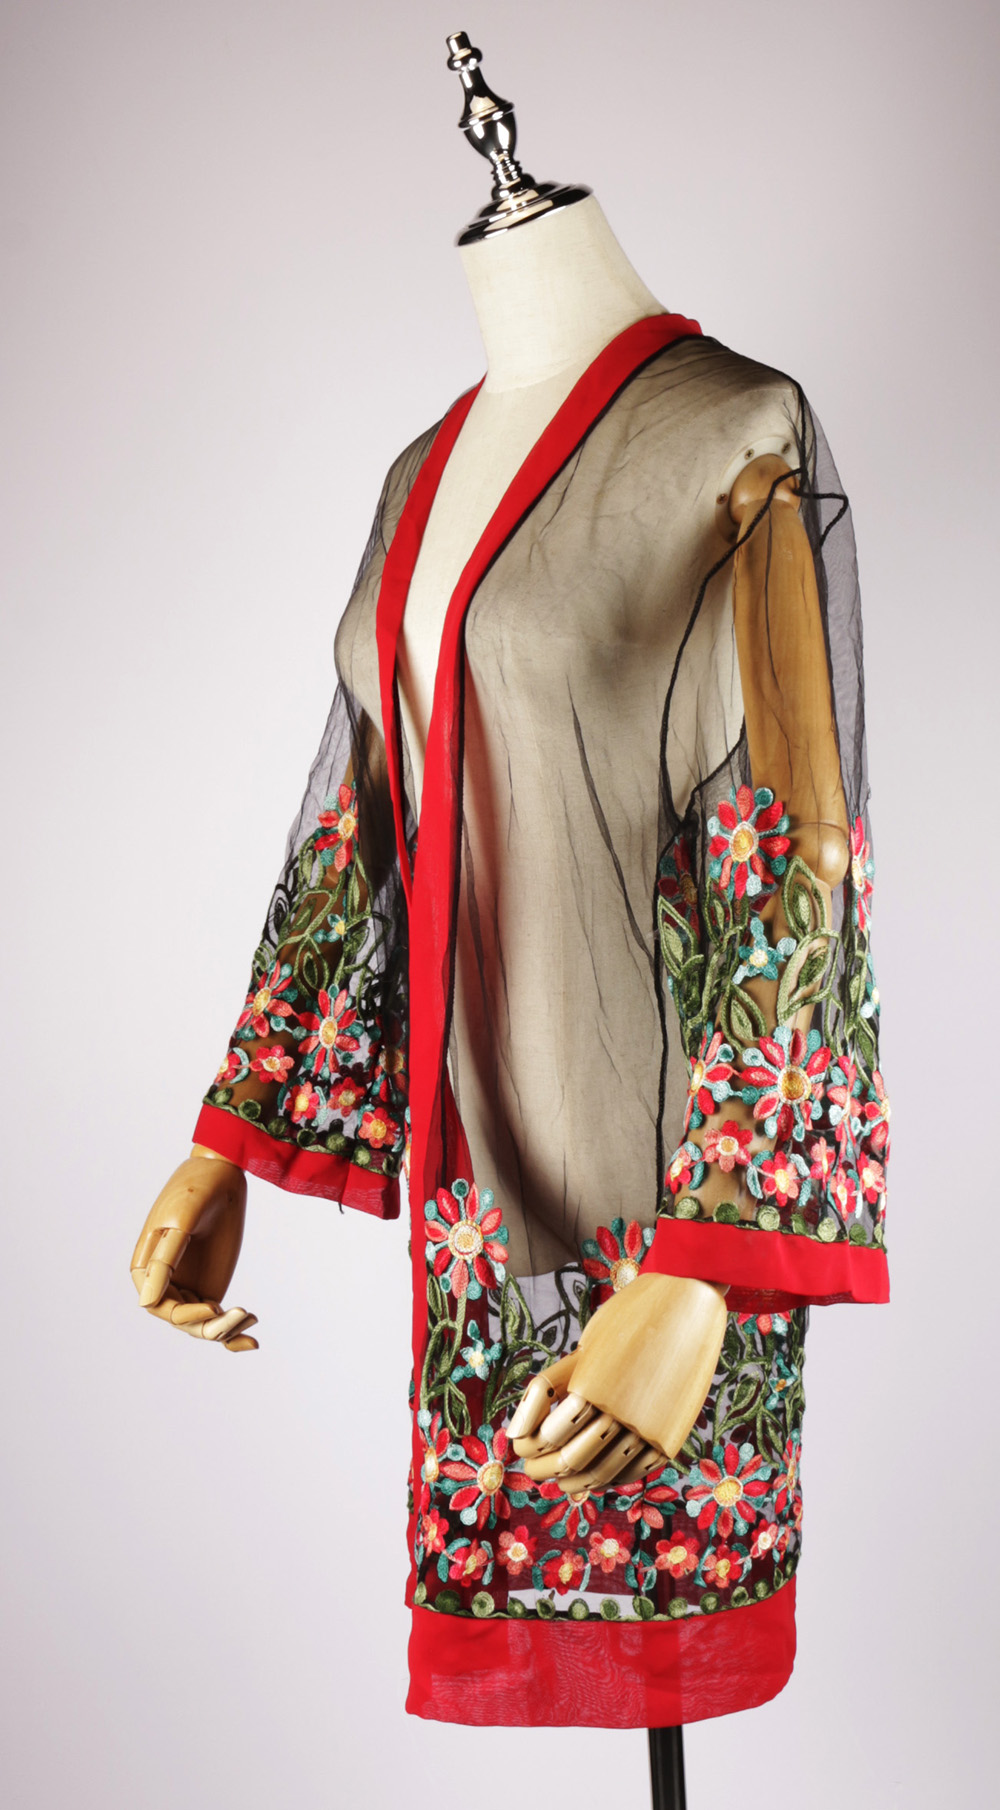 LEK2135 embroidered kimonos side